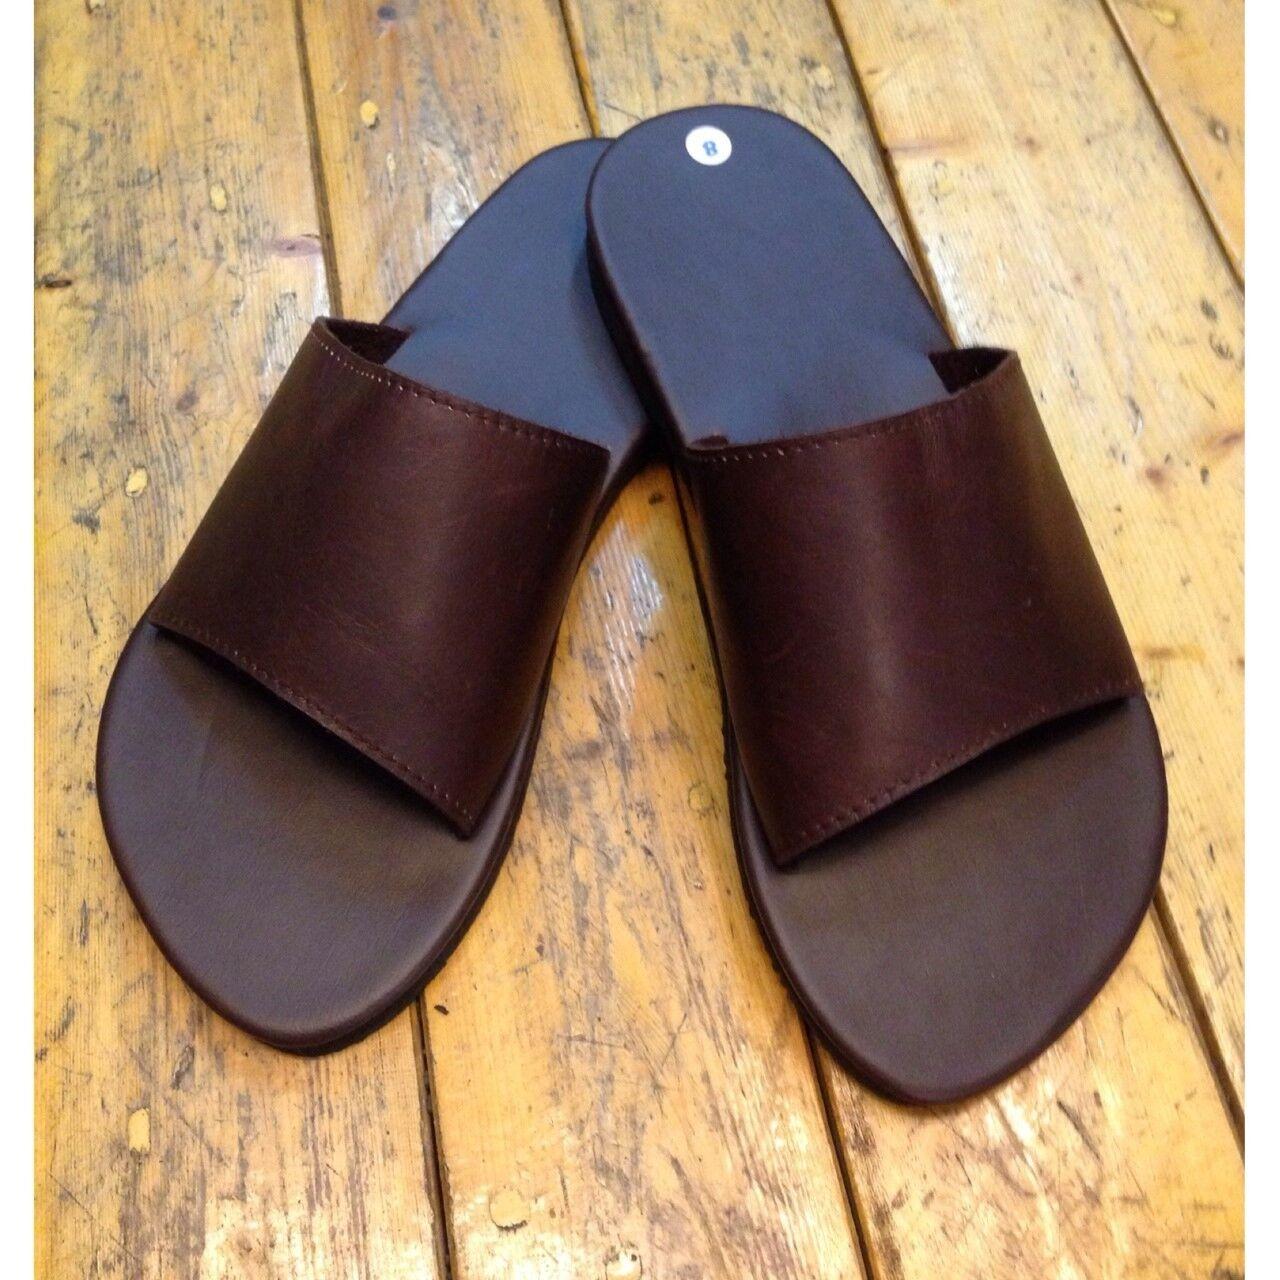 Vtg 70s nos mens 12 leather hippie sandals w tire tread soles |Hippie Mens Leather Sandals